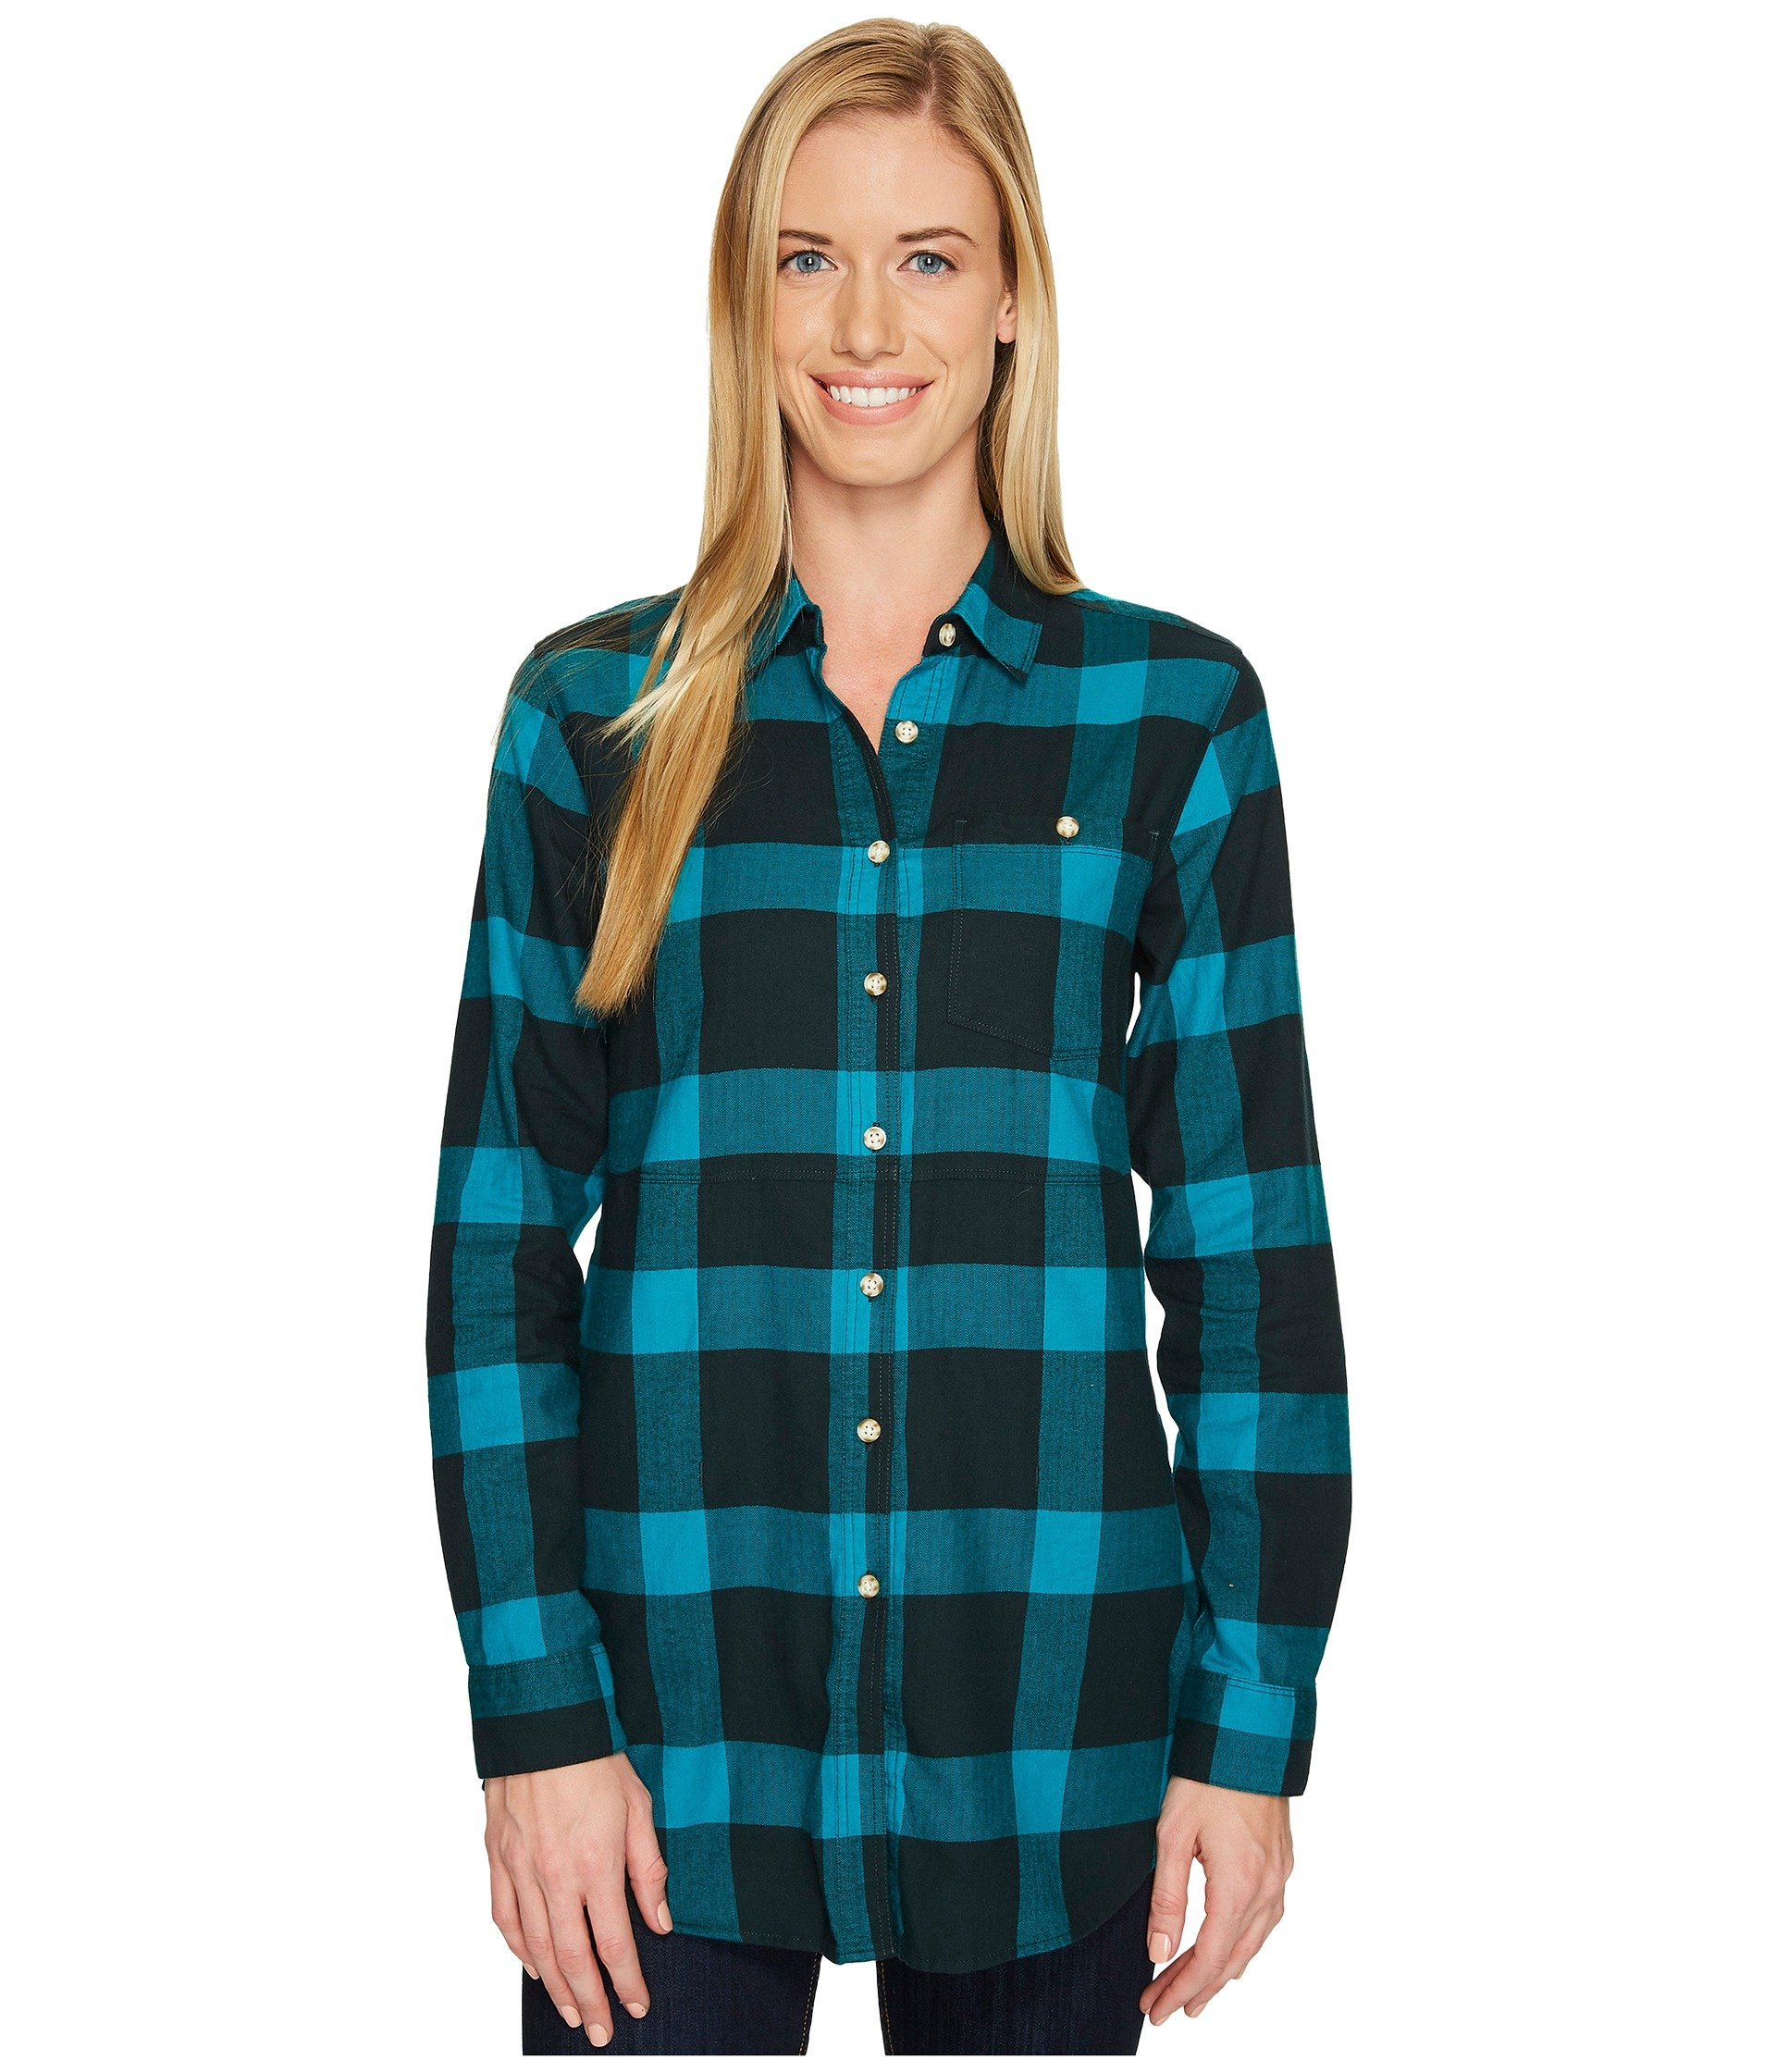 MOUNTAIN HARDWEAR Pt. Isabel Long Sleeve Tunic, Blue Spruce